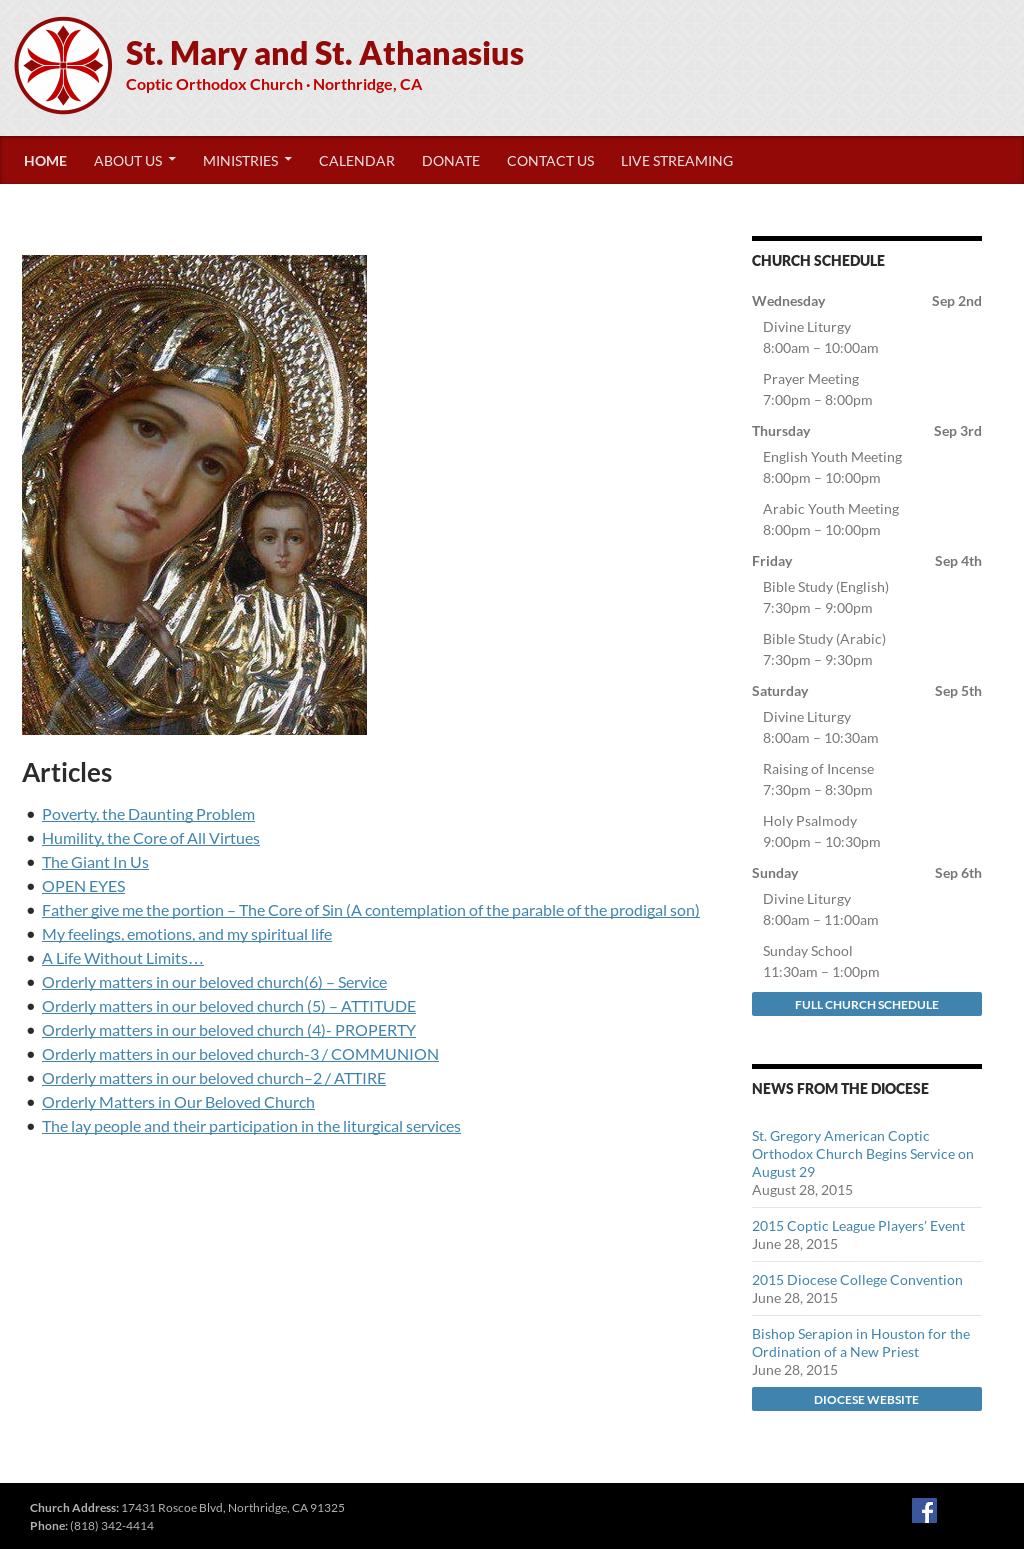 St Mary And St Athanasius Coptic Orthodox Church Northridge Ca